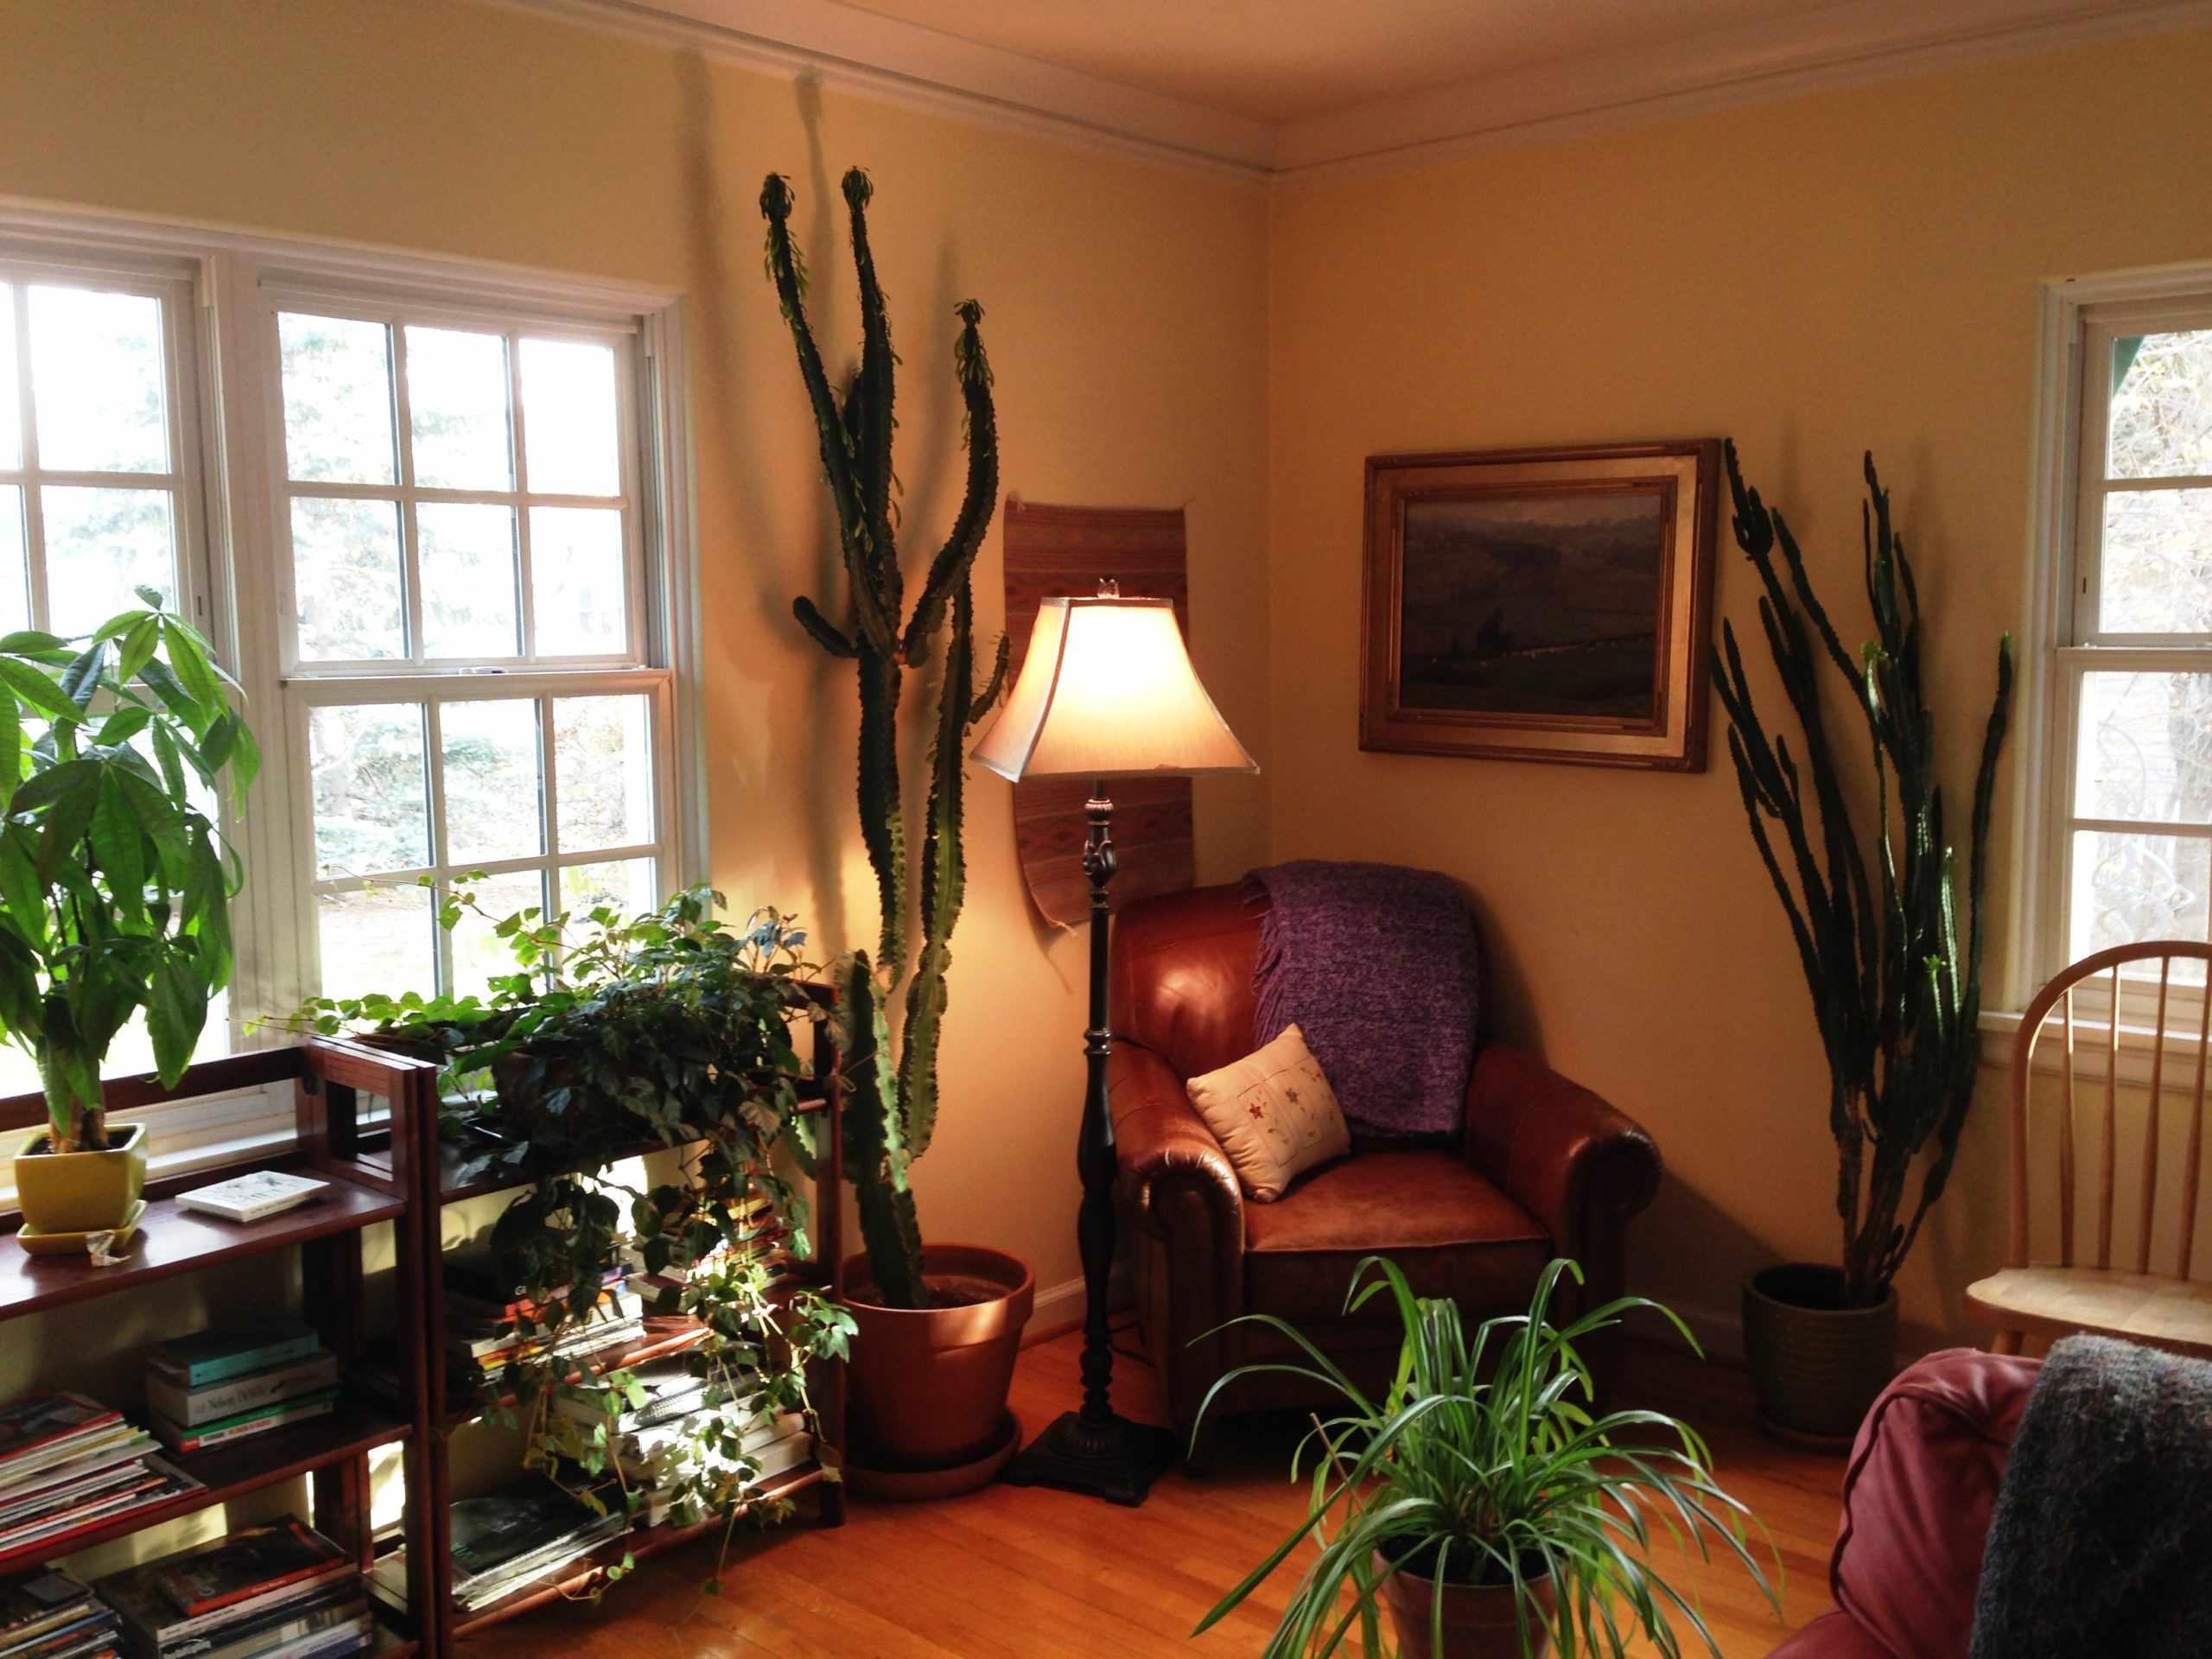 Зона мудрости и знаний по фен шуй в квартире